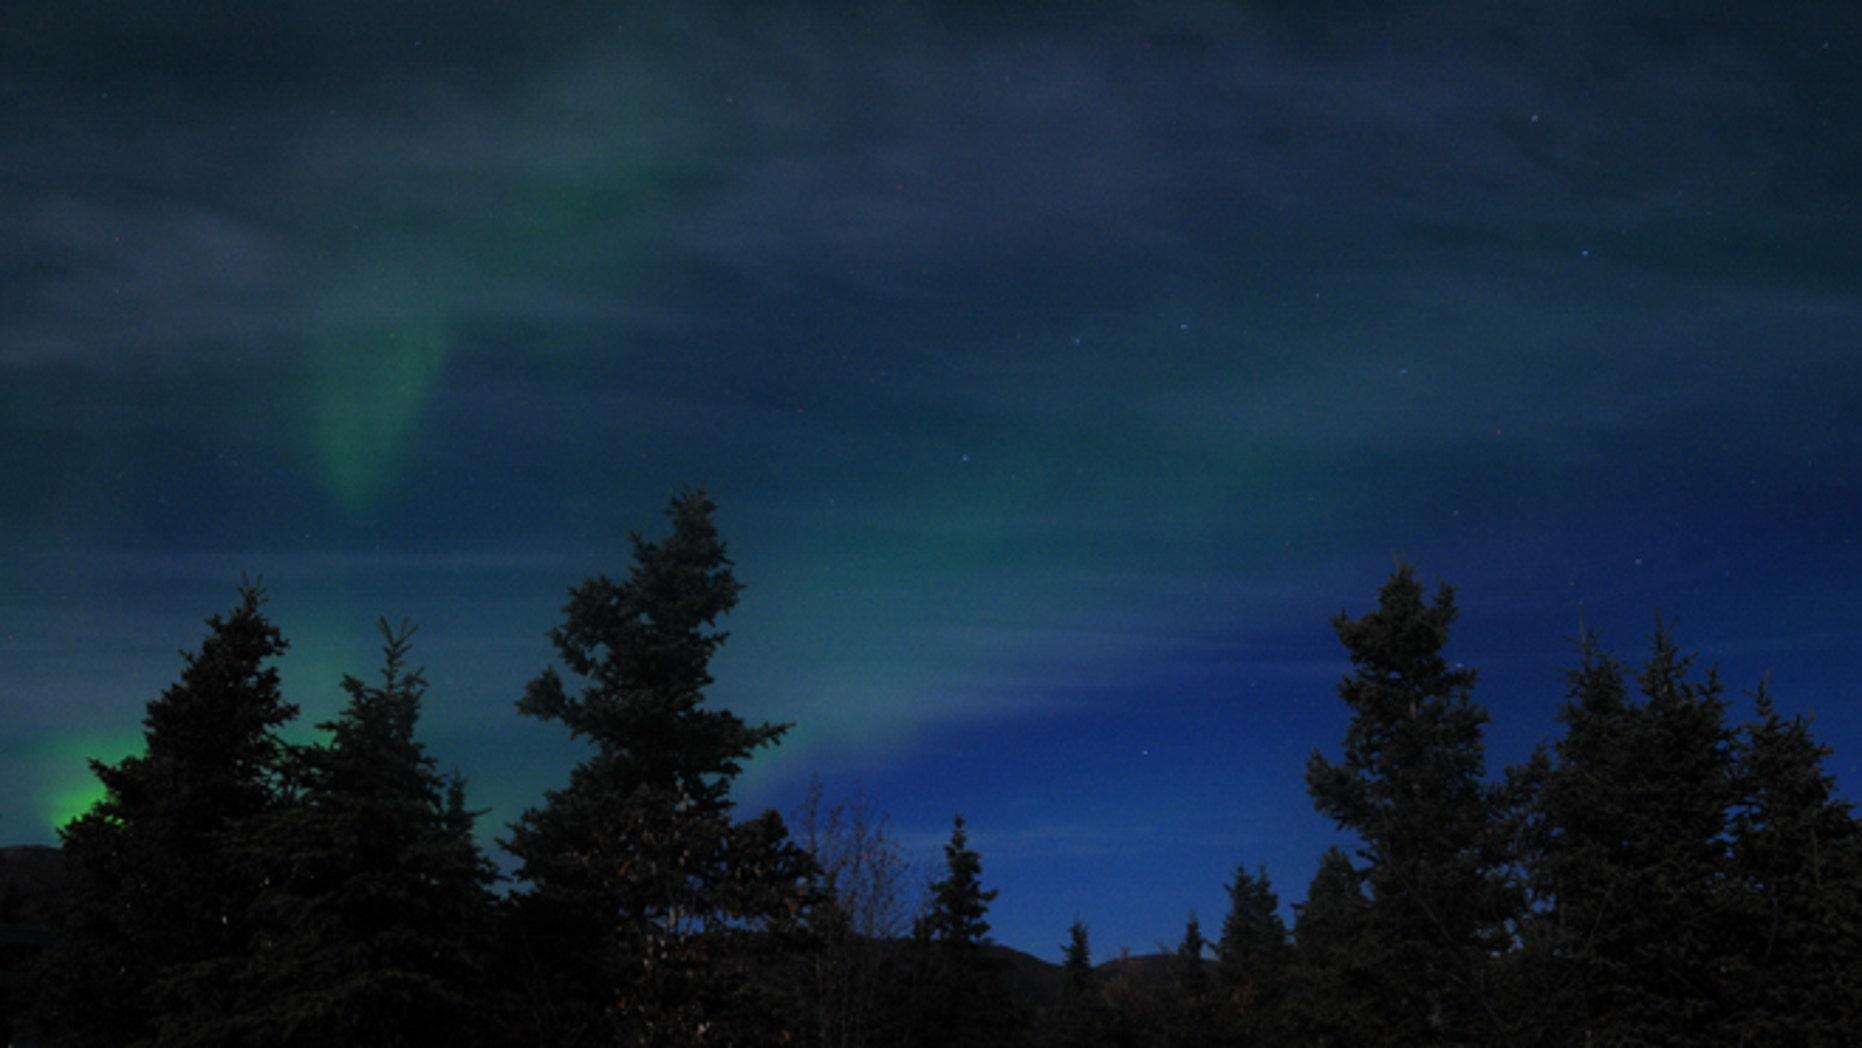 Aurora borealis at Denali National Park and Preserve in Alaska